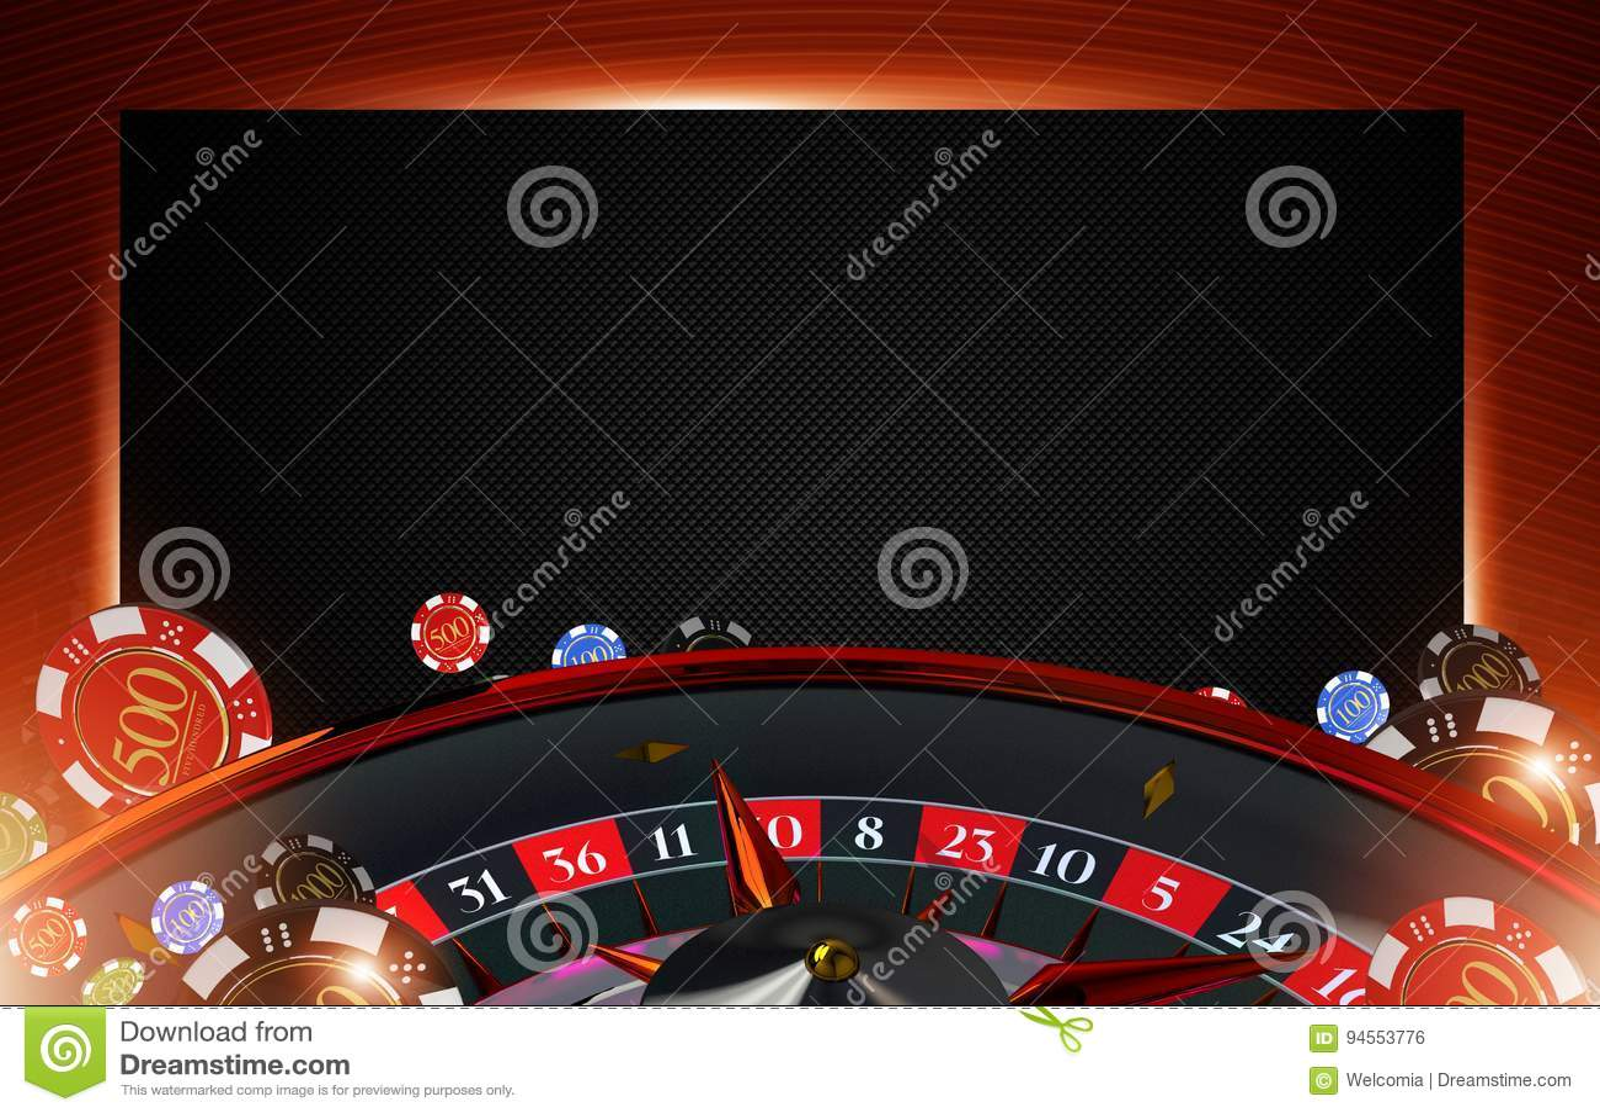 Casino copy g casino poker results